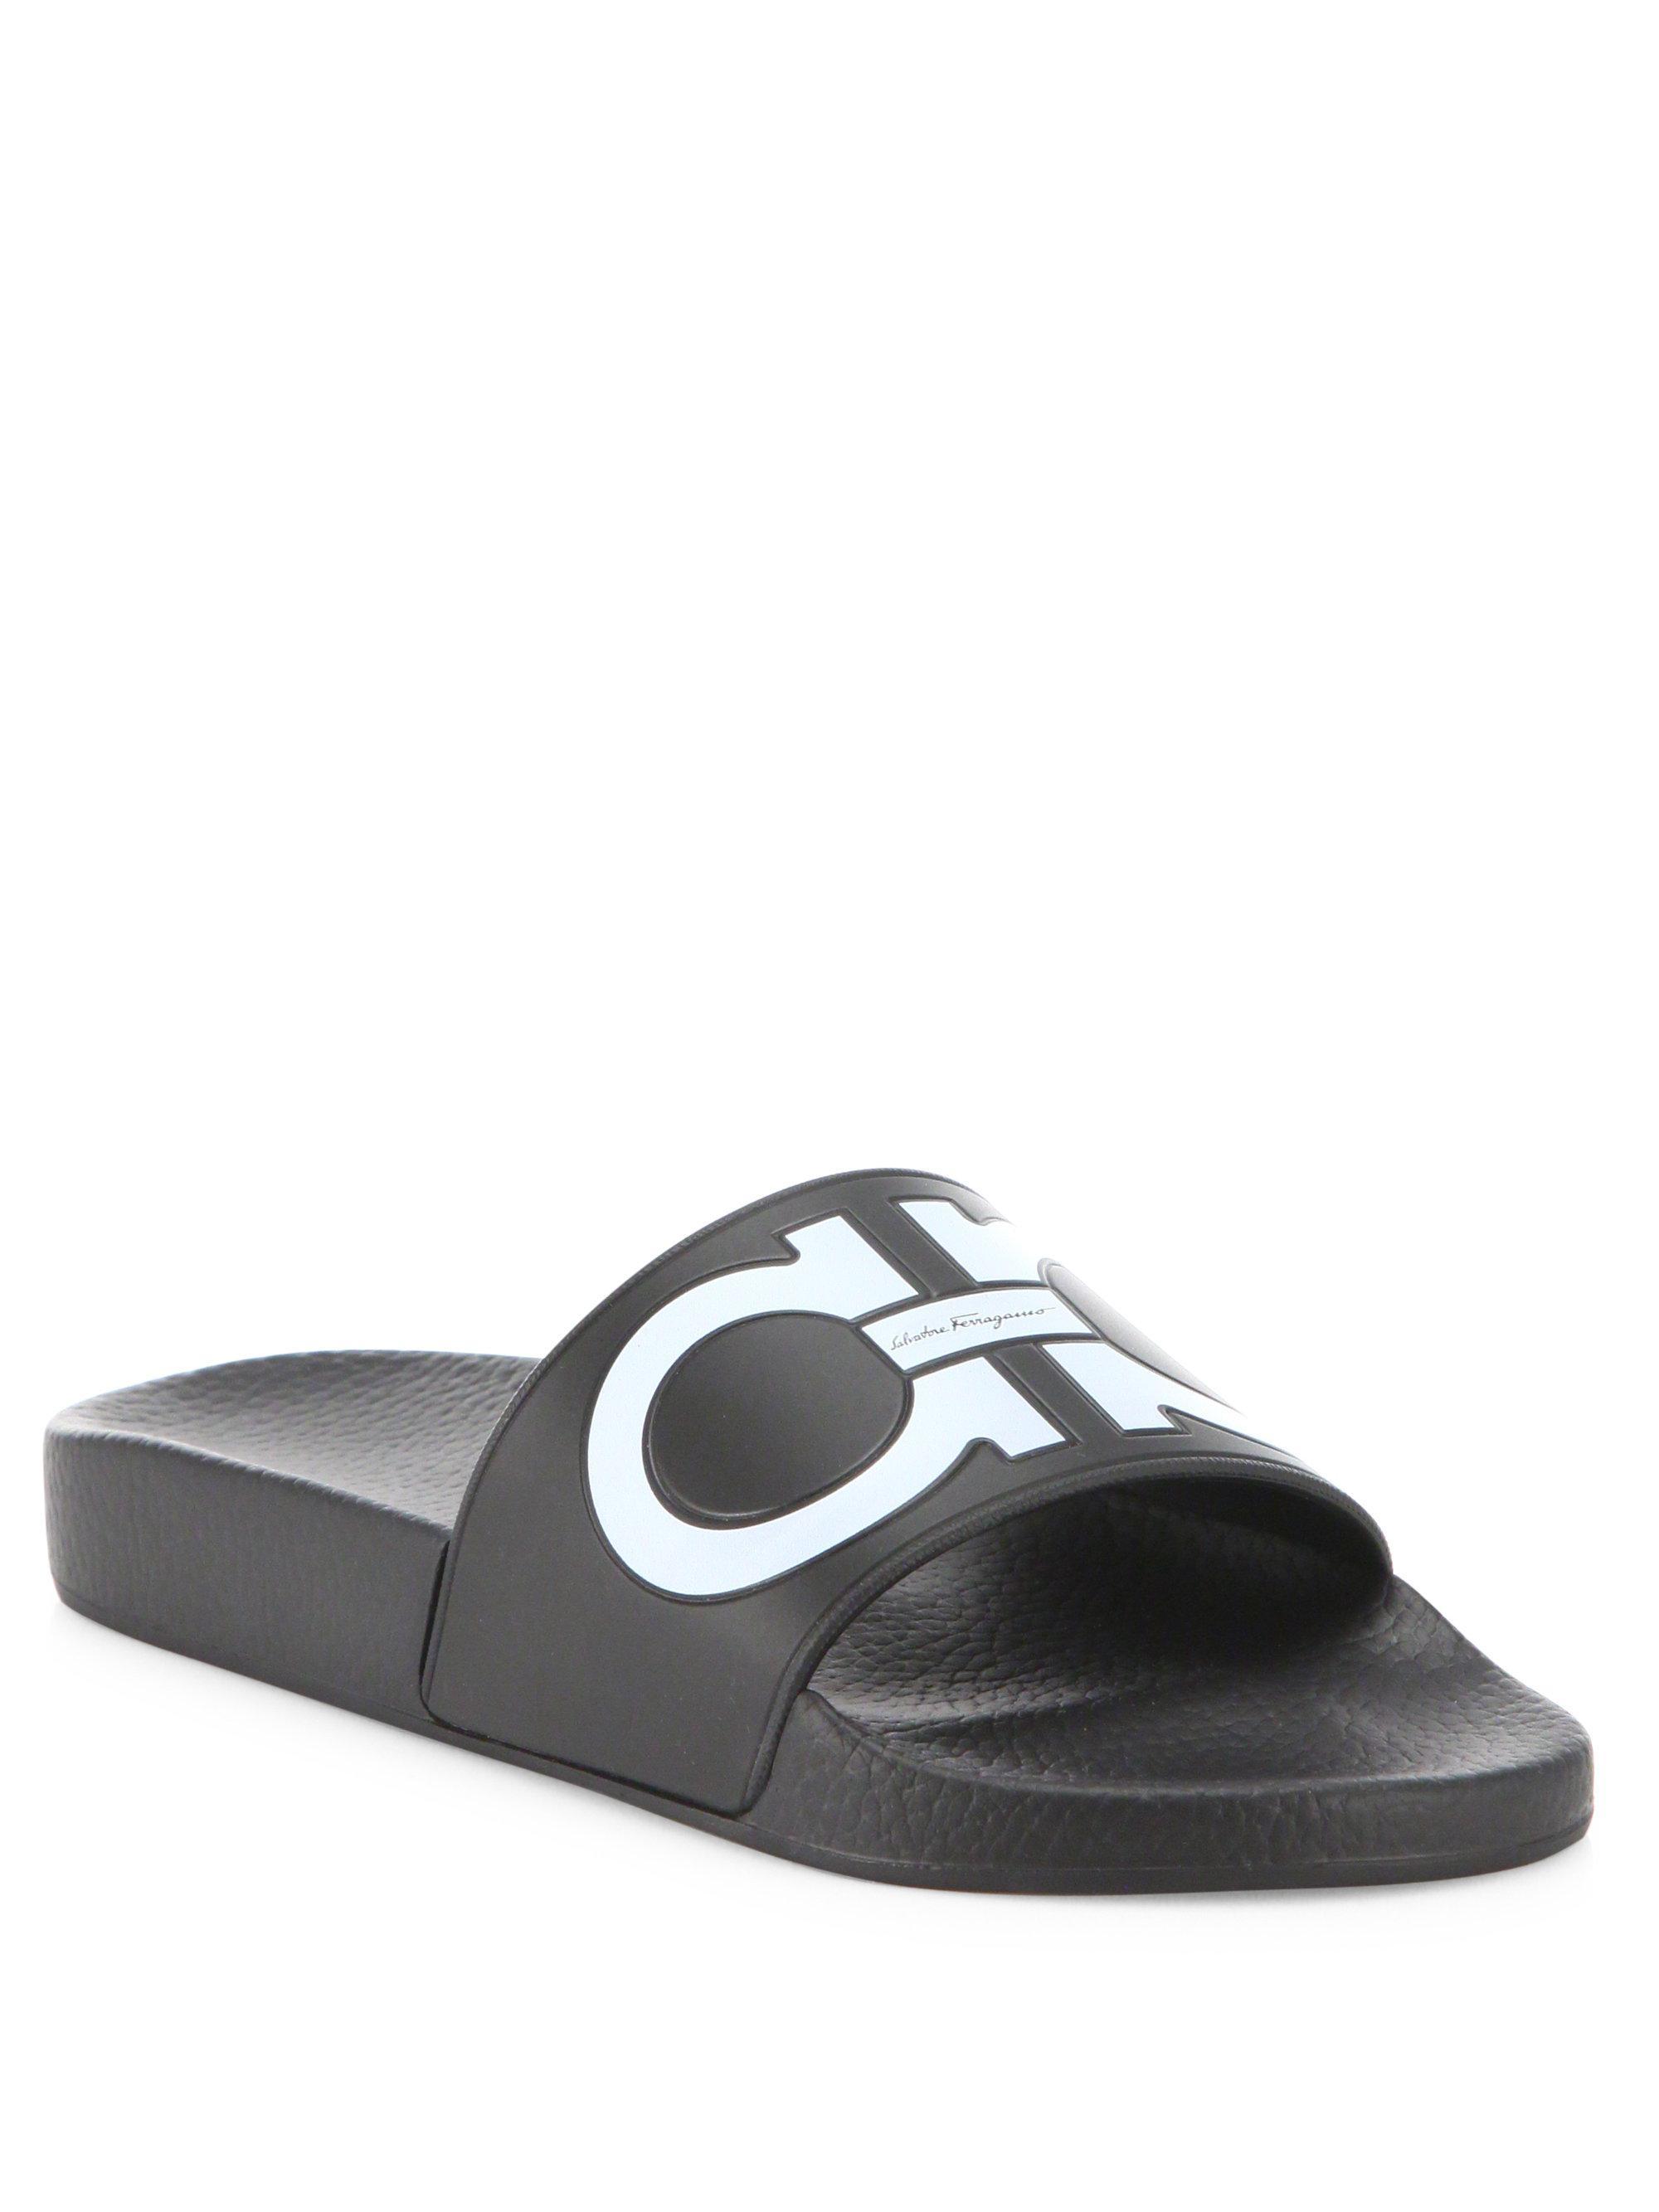 e622ad3537b7 Ferragamo Groove Slide Sandal in Black - Save 9.407665505226475% - Lyst